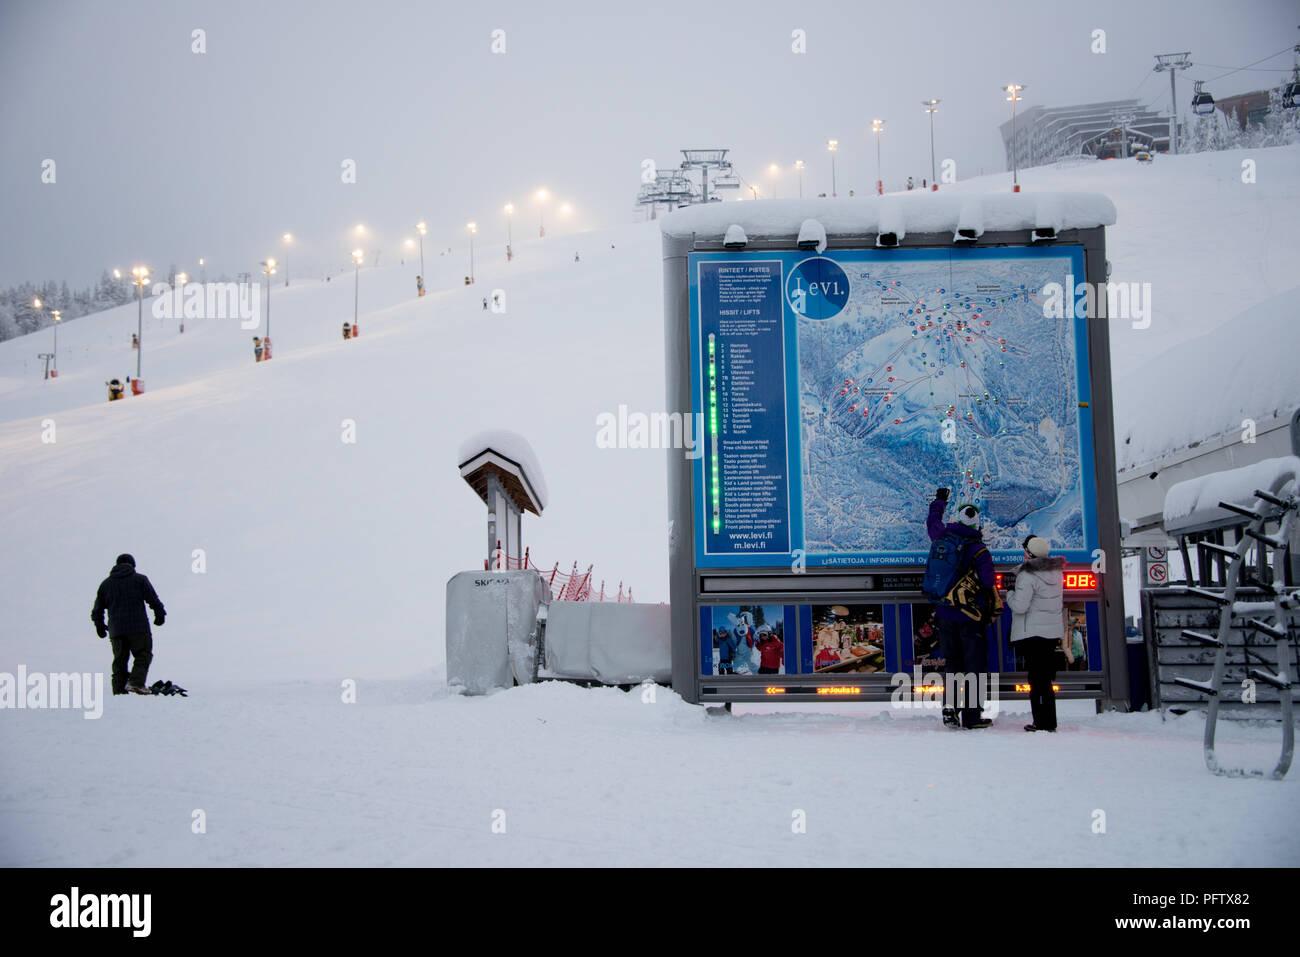 The ski resort at Levi in Lapland Norway - Stock Image